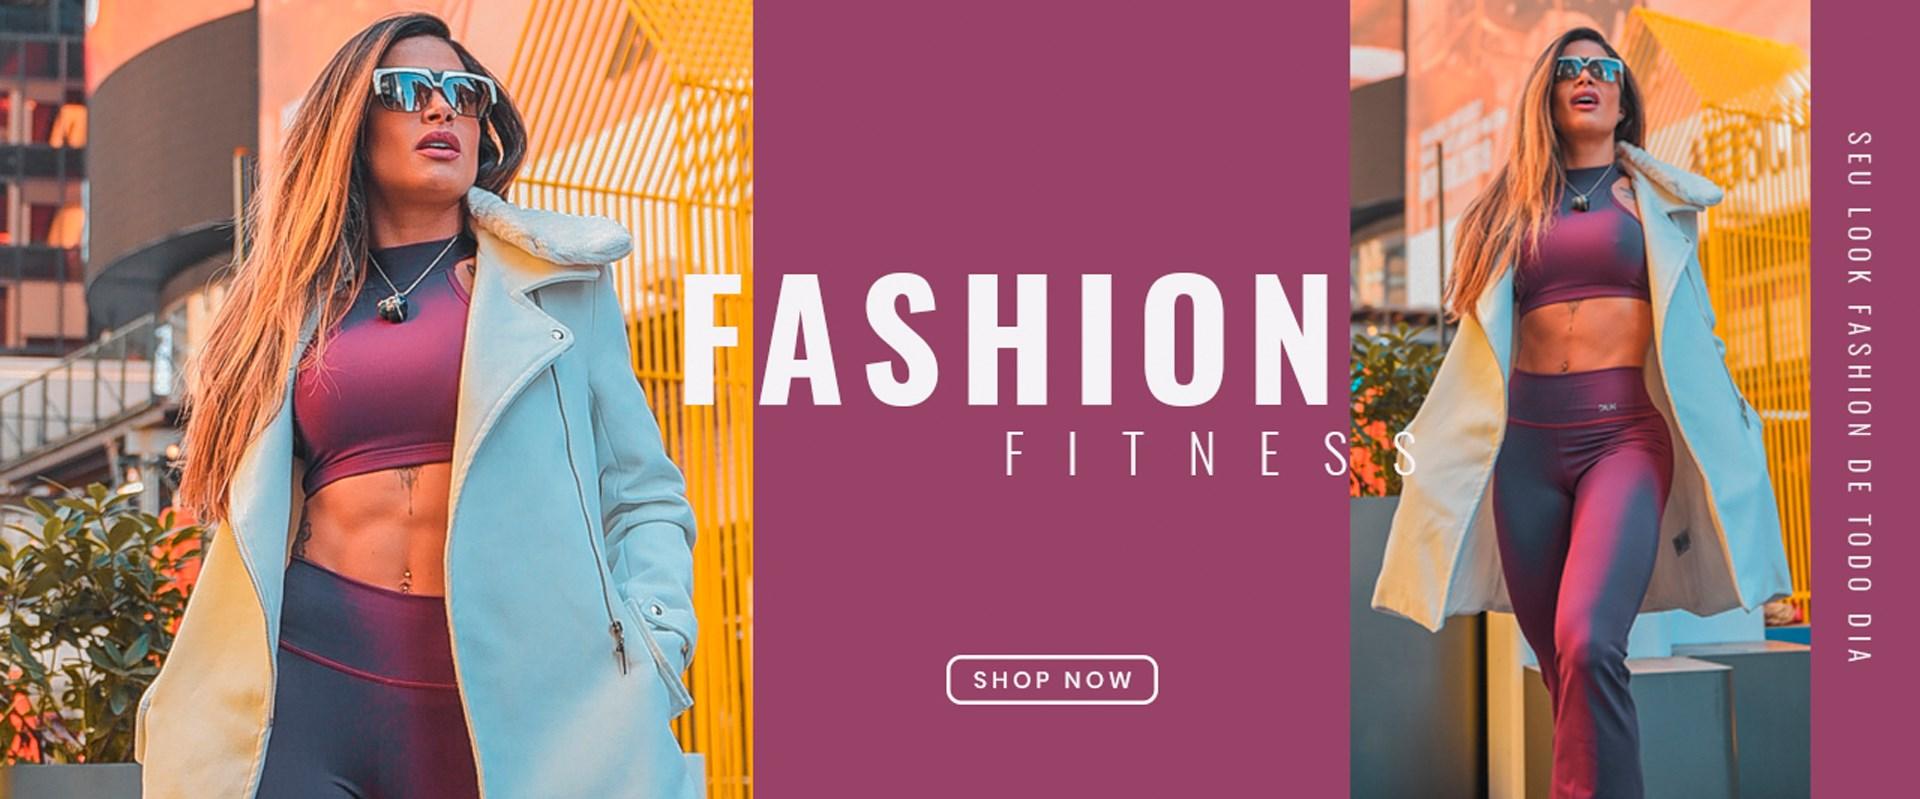 Fashion Fitness